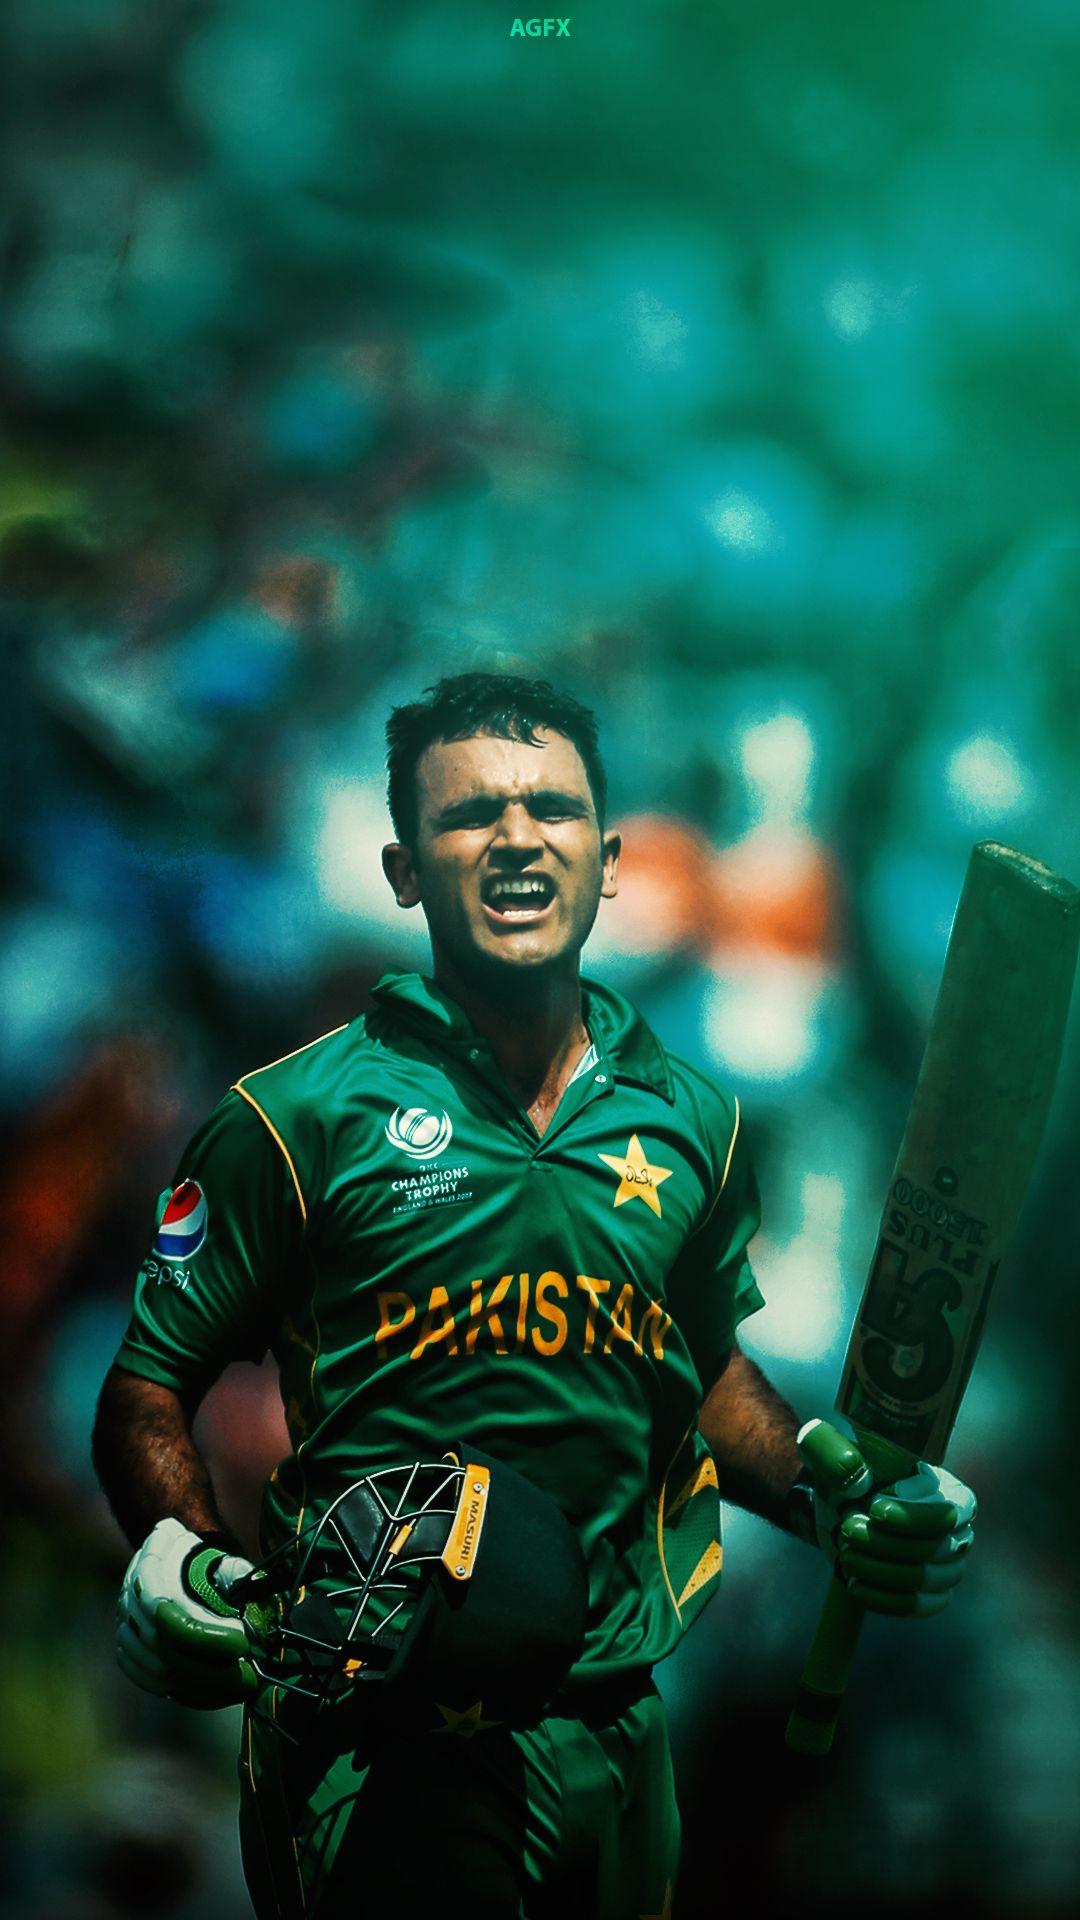 Cricket | Pakistan | PSL - Wallpaper #PSL #Wallpaper #edit #photoshop #Cricket #icc #ct #pakistan #art #artist #editing #photoedit #wallpaper ...